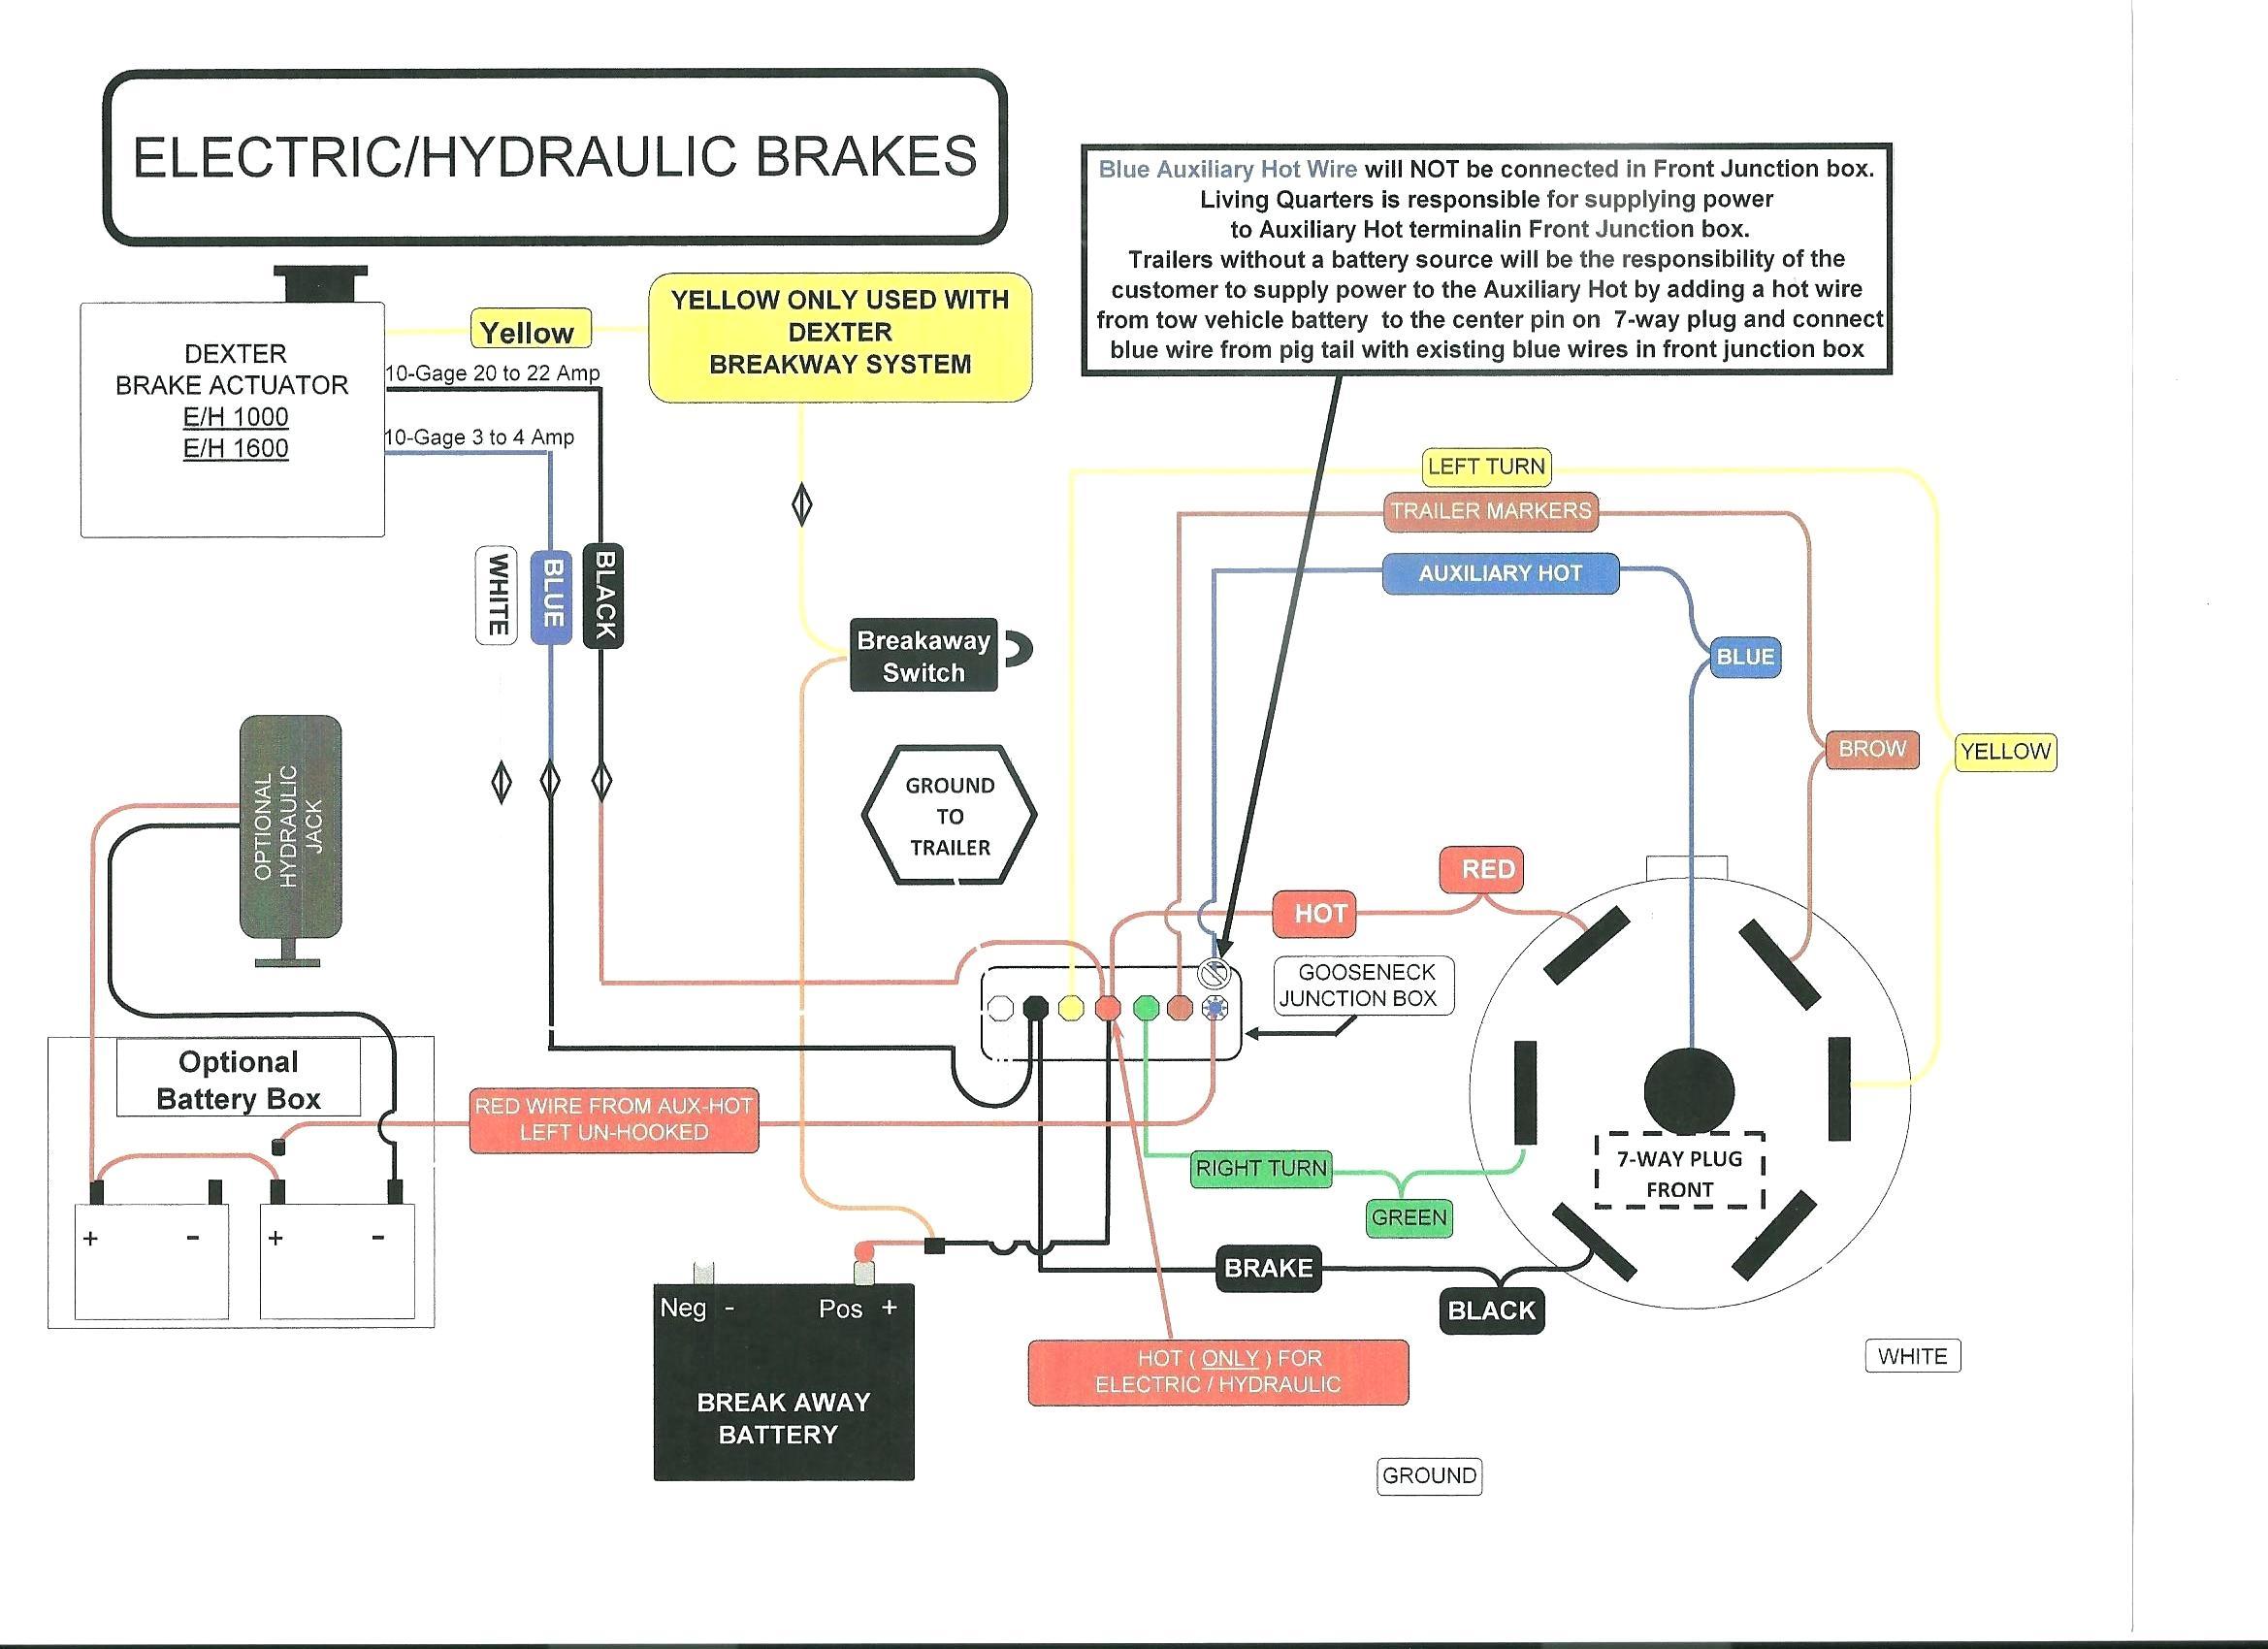 Sensational Hopkins 42245 Wiring Diagram Wiring Diagram Wiring Cloud Xempagosophoxytasticioscodnessplanboapumohammedshrineorg